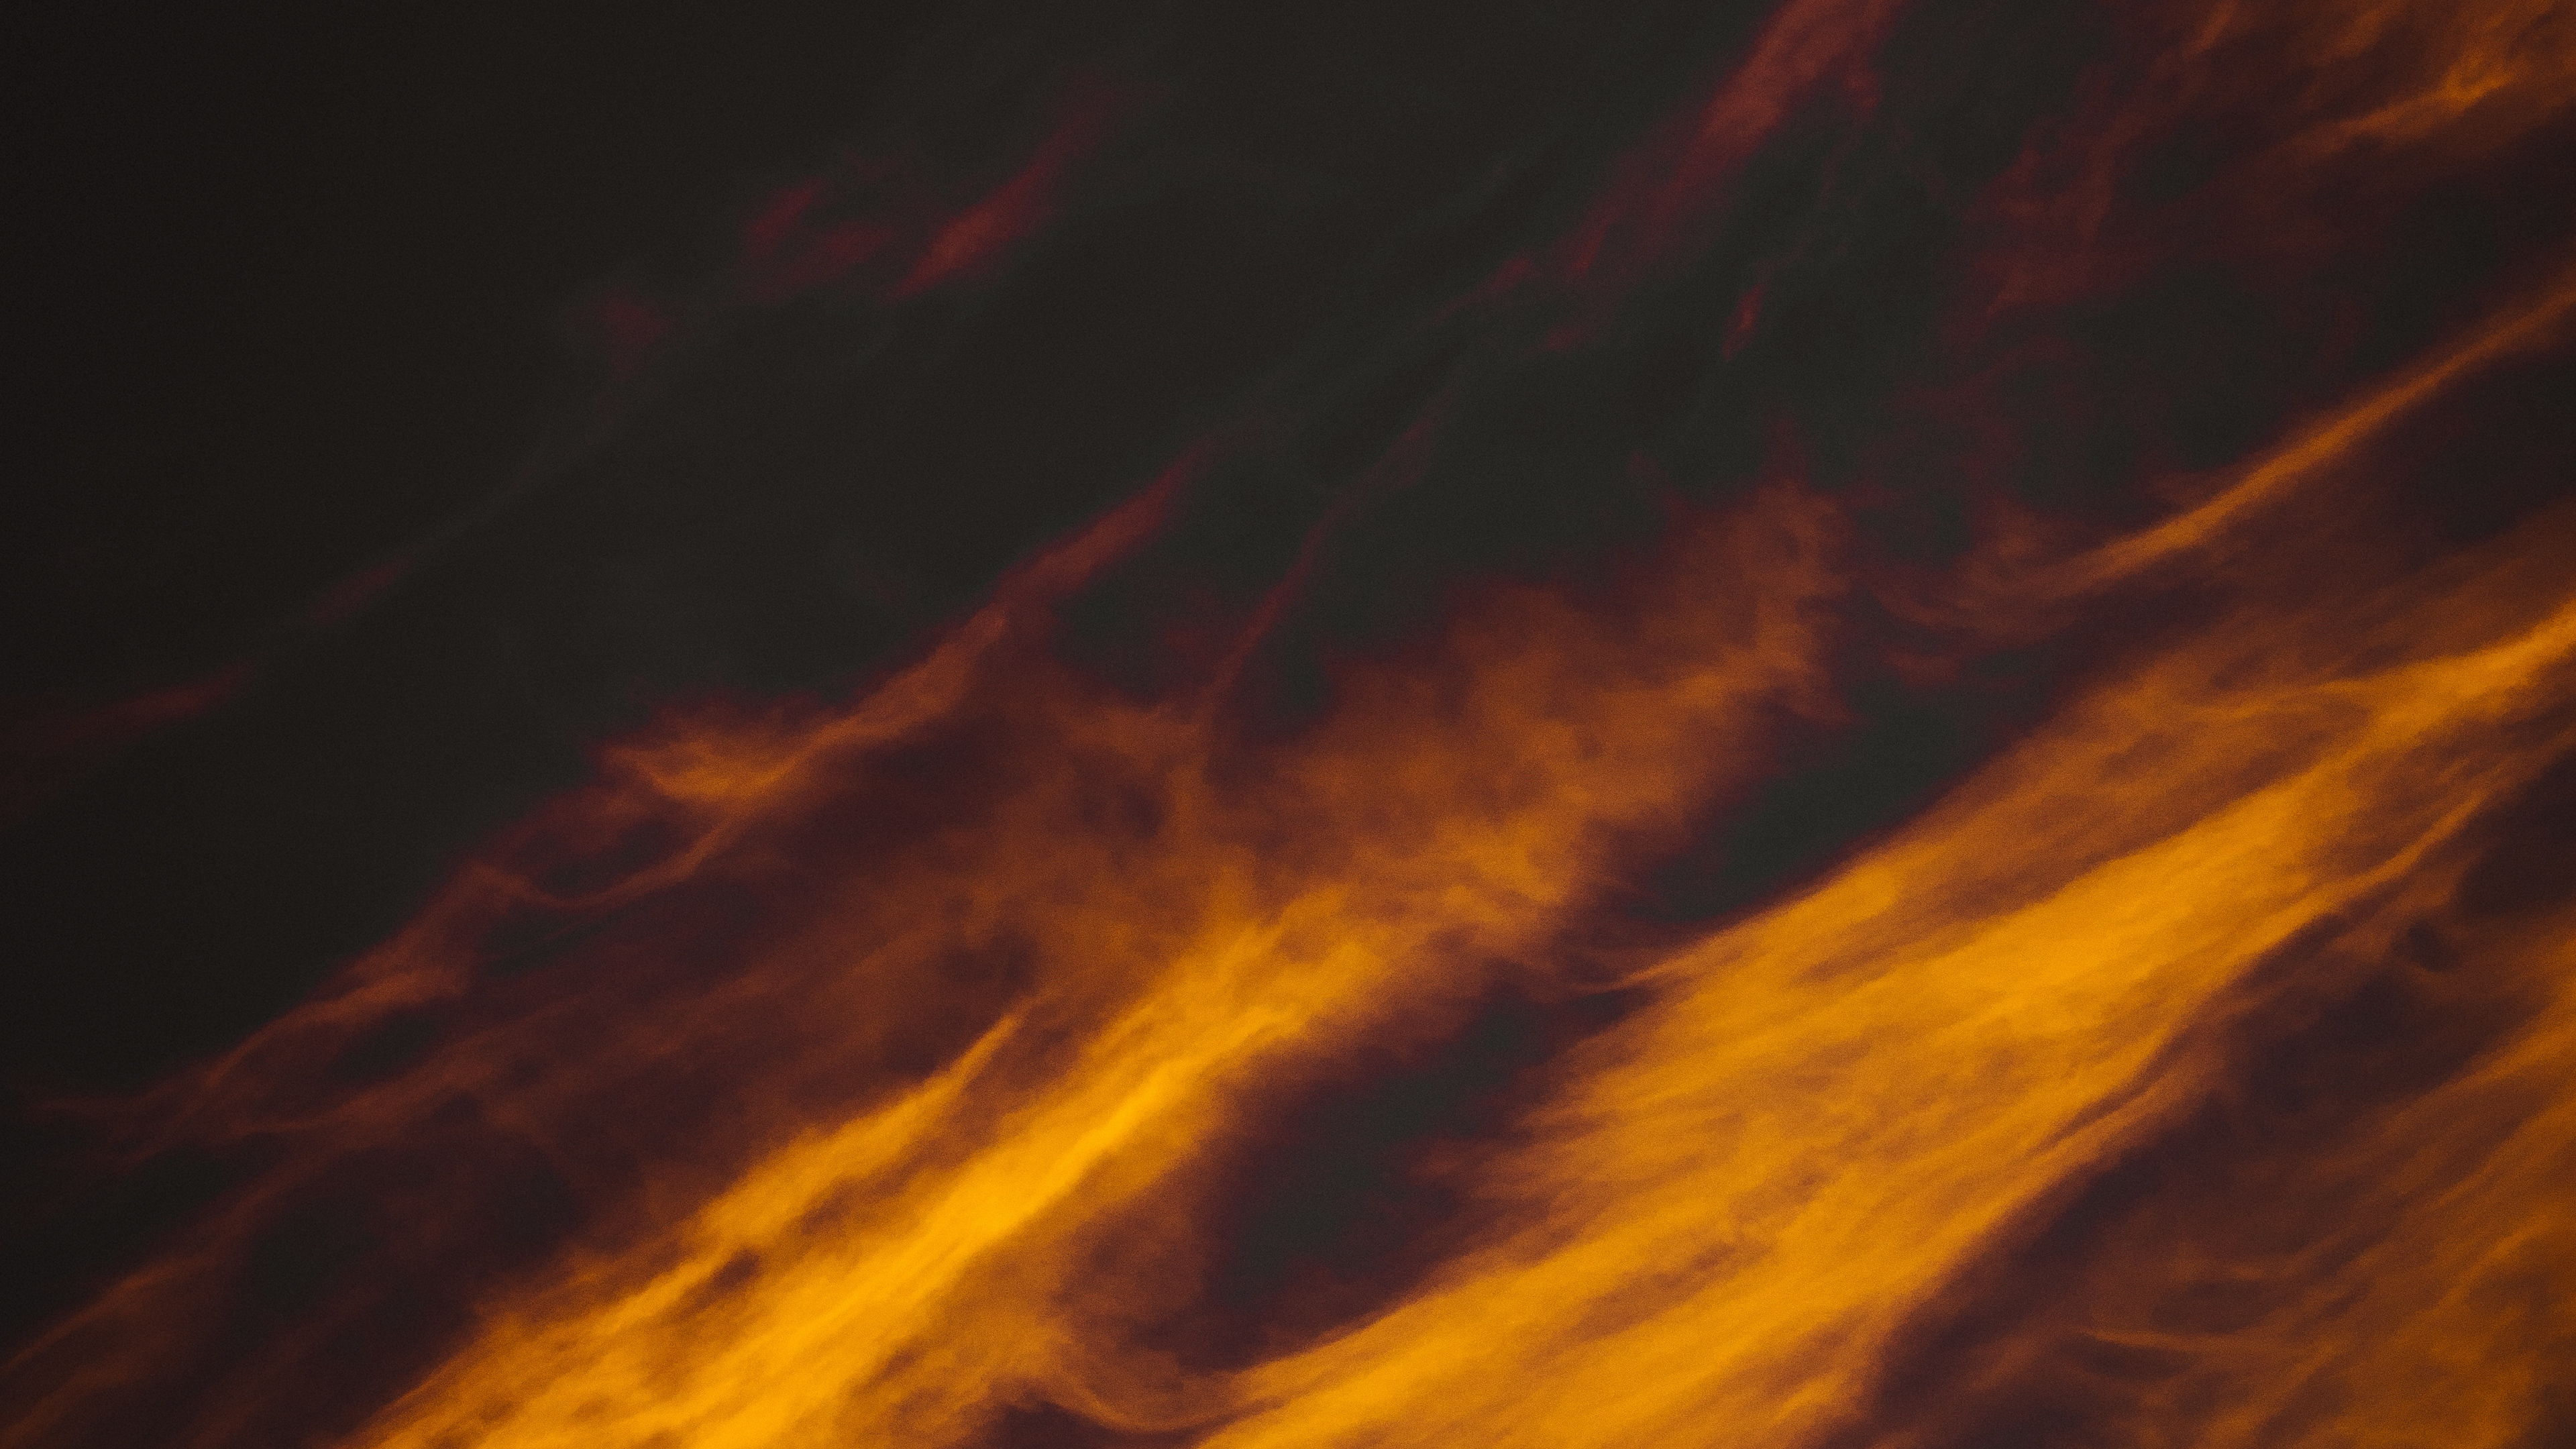 clouds porous sunset sky 4k 1541115195 - clouds, porous, sunset, sky 4k - sunset, porous, Clouds